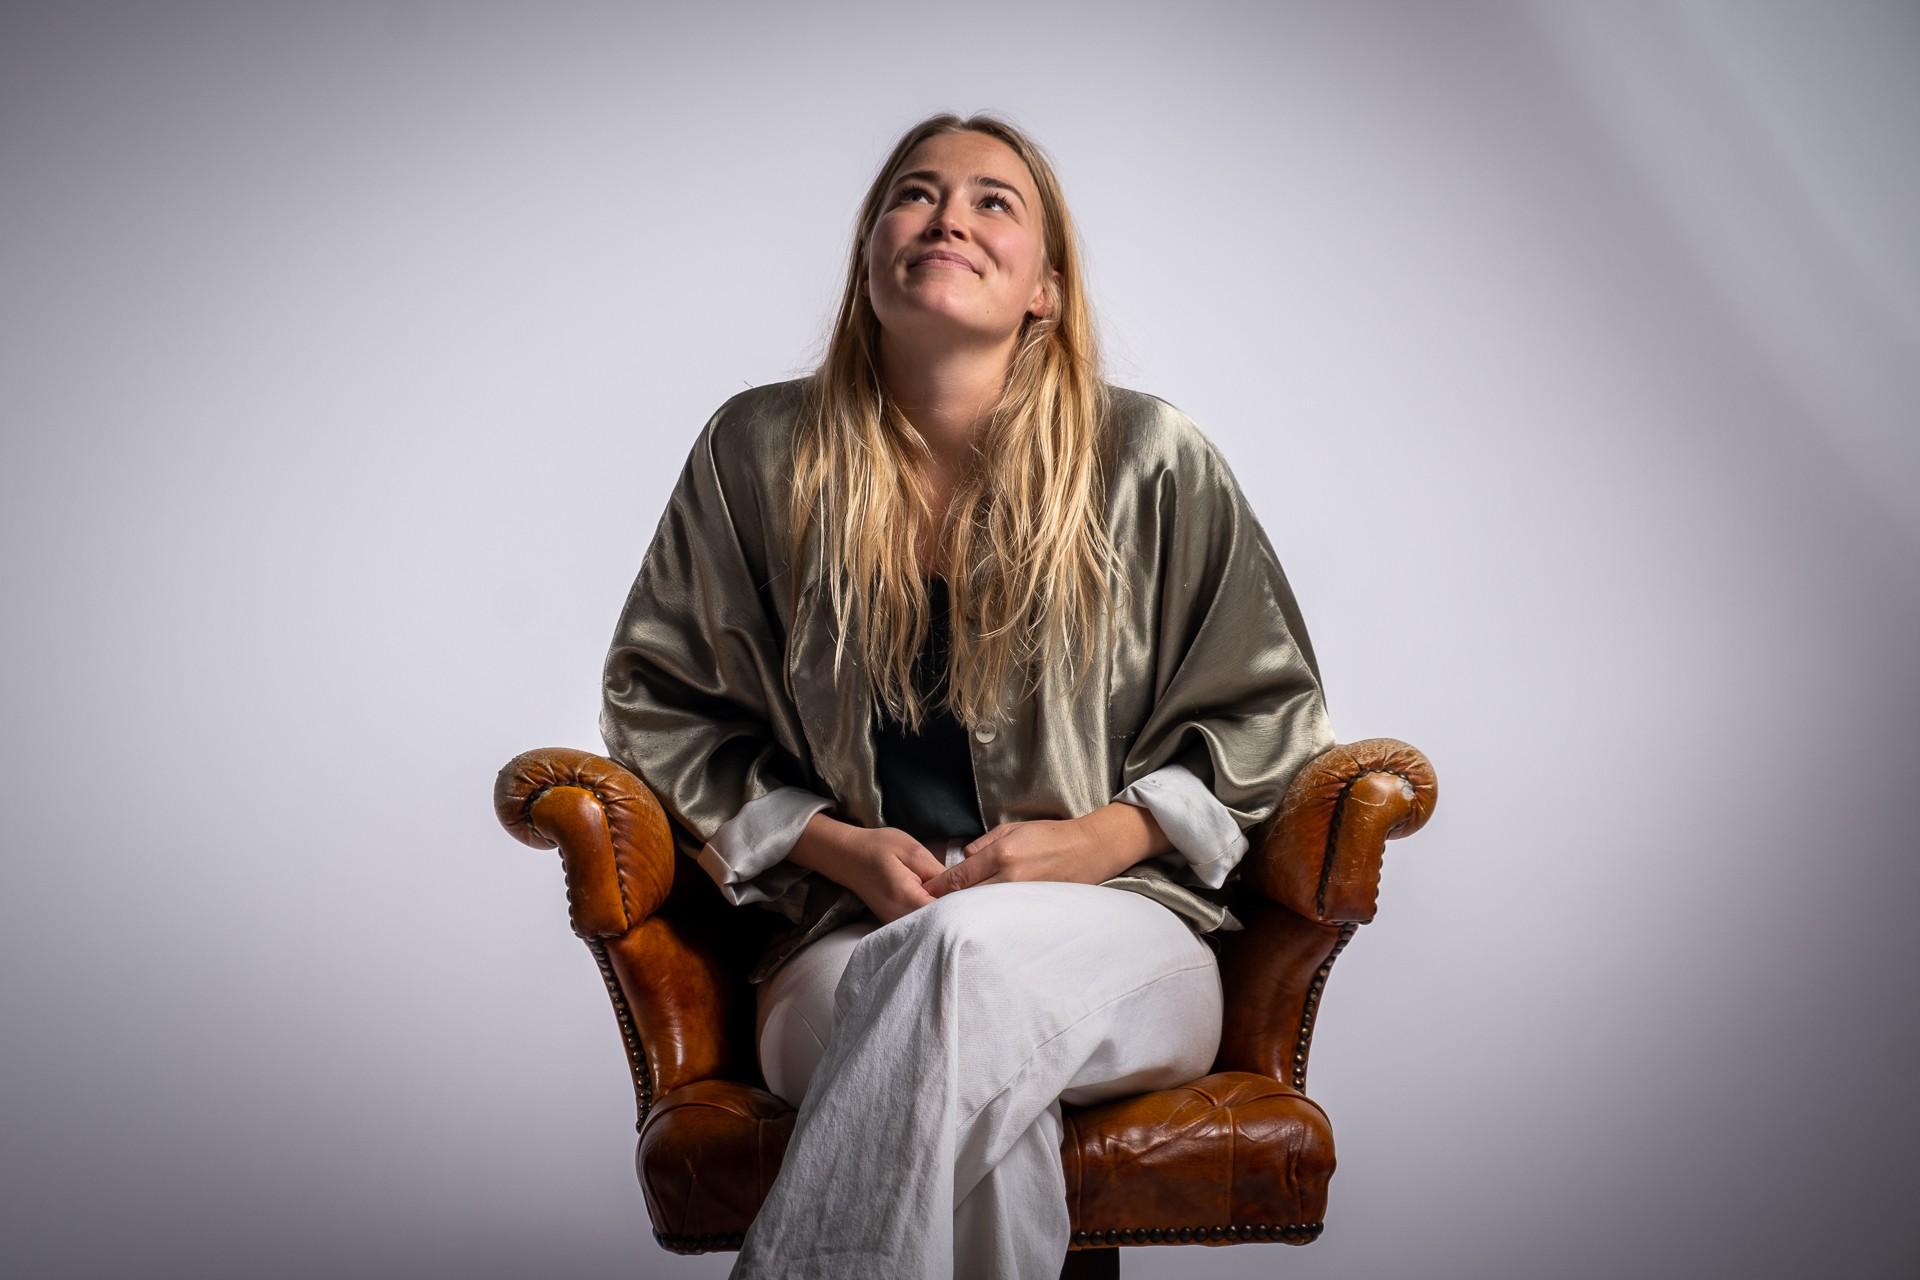 Geraldine Kemper (30)